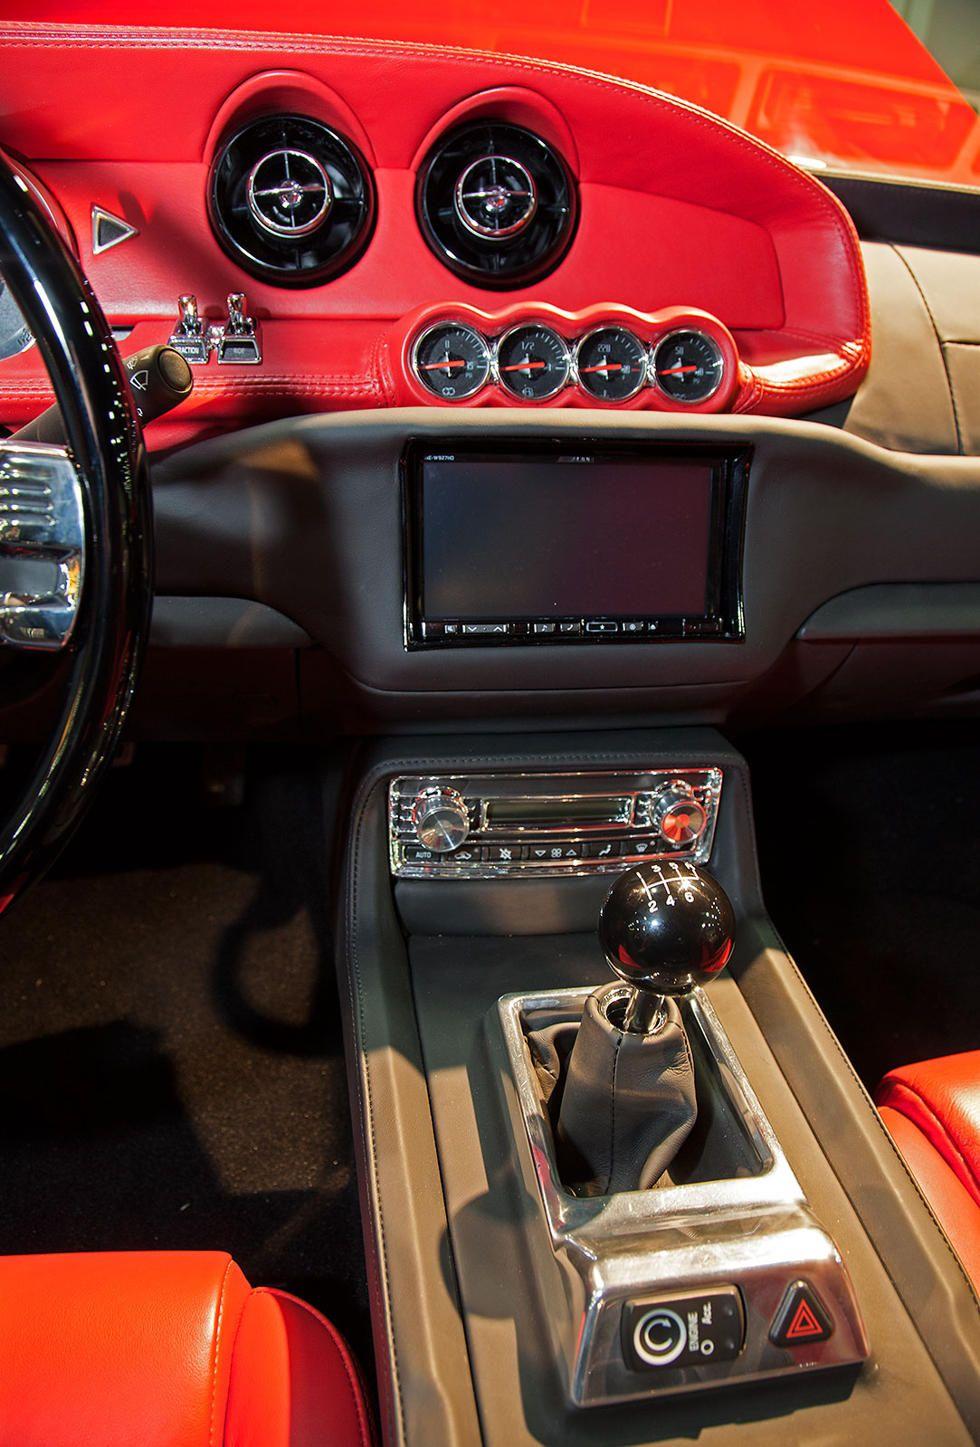 1993 mazda rx 7 retro review equus bass 770 pinterest autos clasicos y clasicos. Black Bedroom Furniture Sets. Home Design Ideas